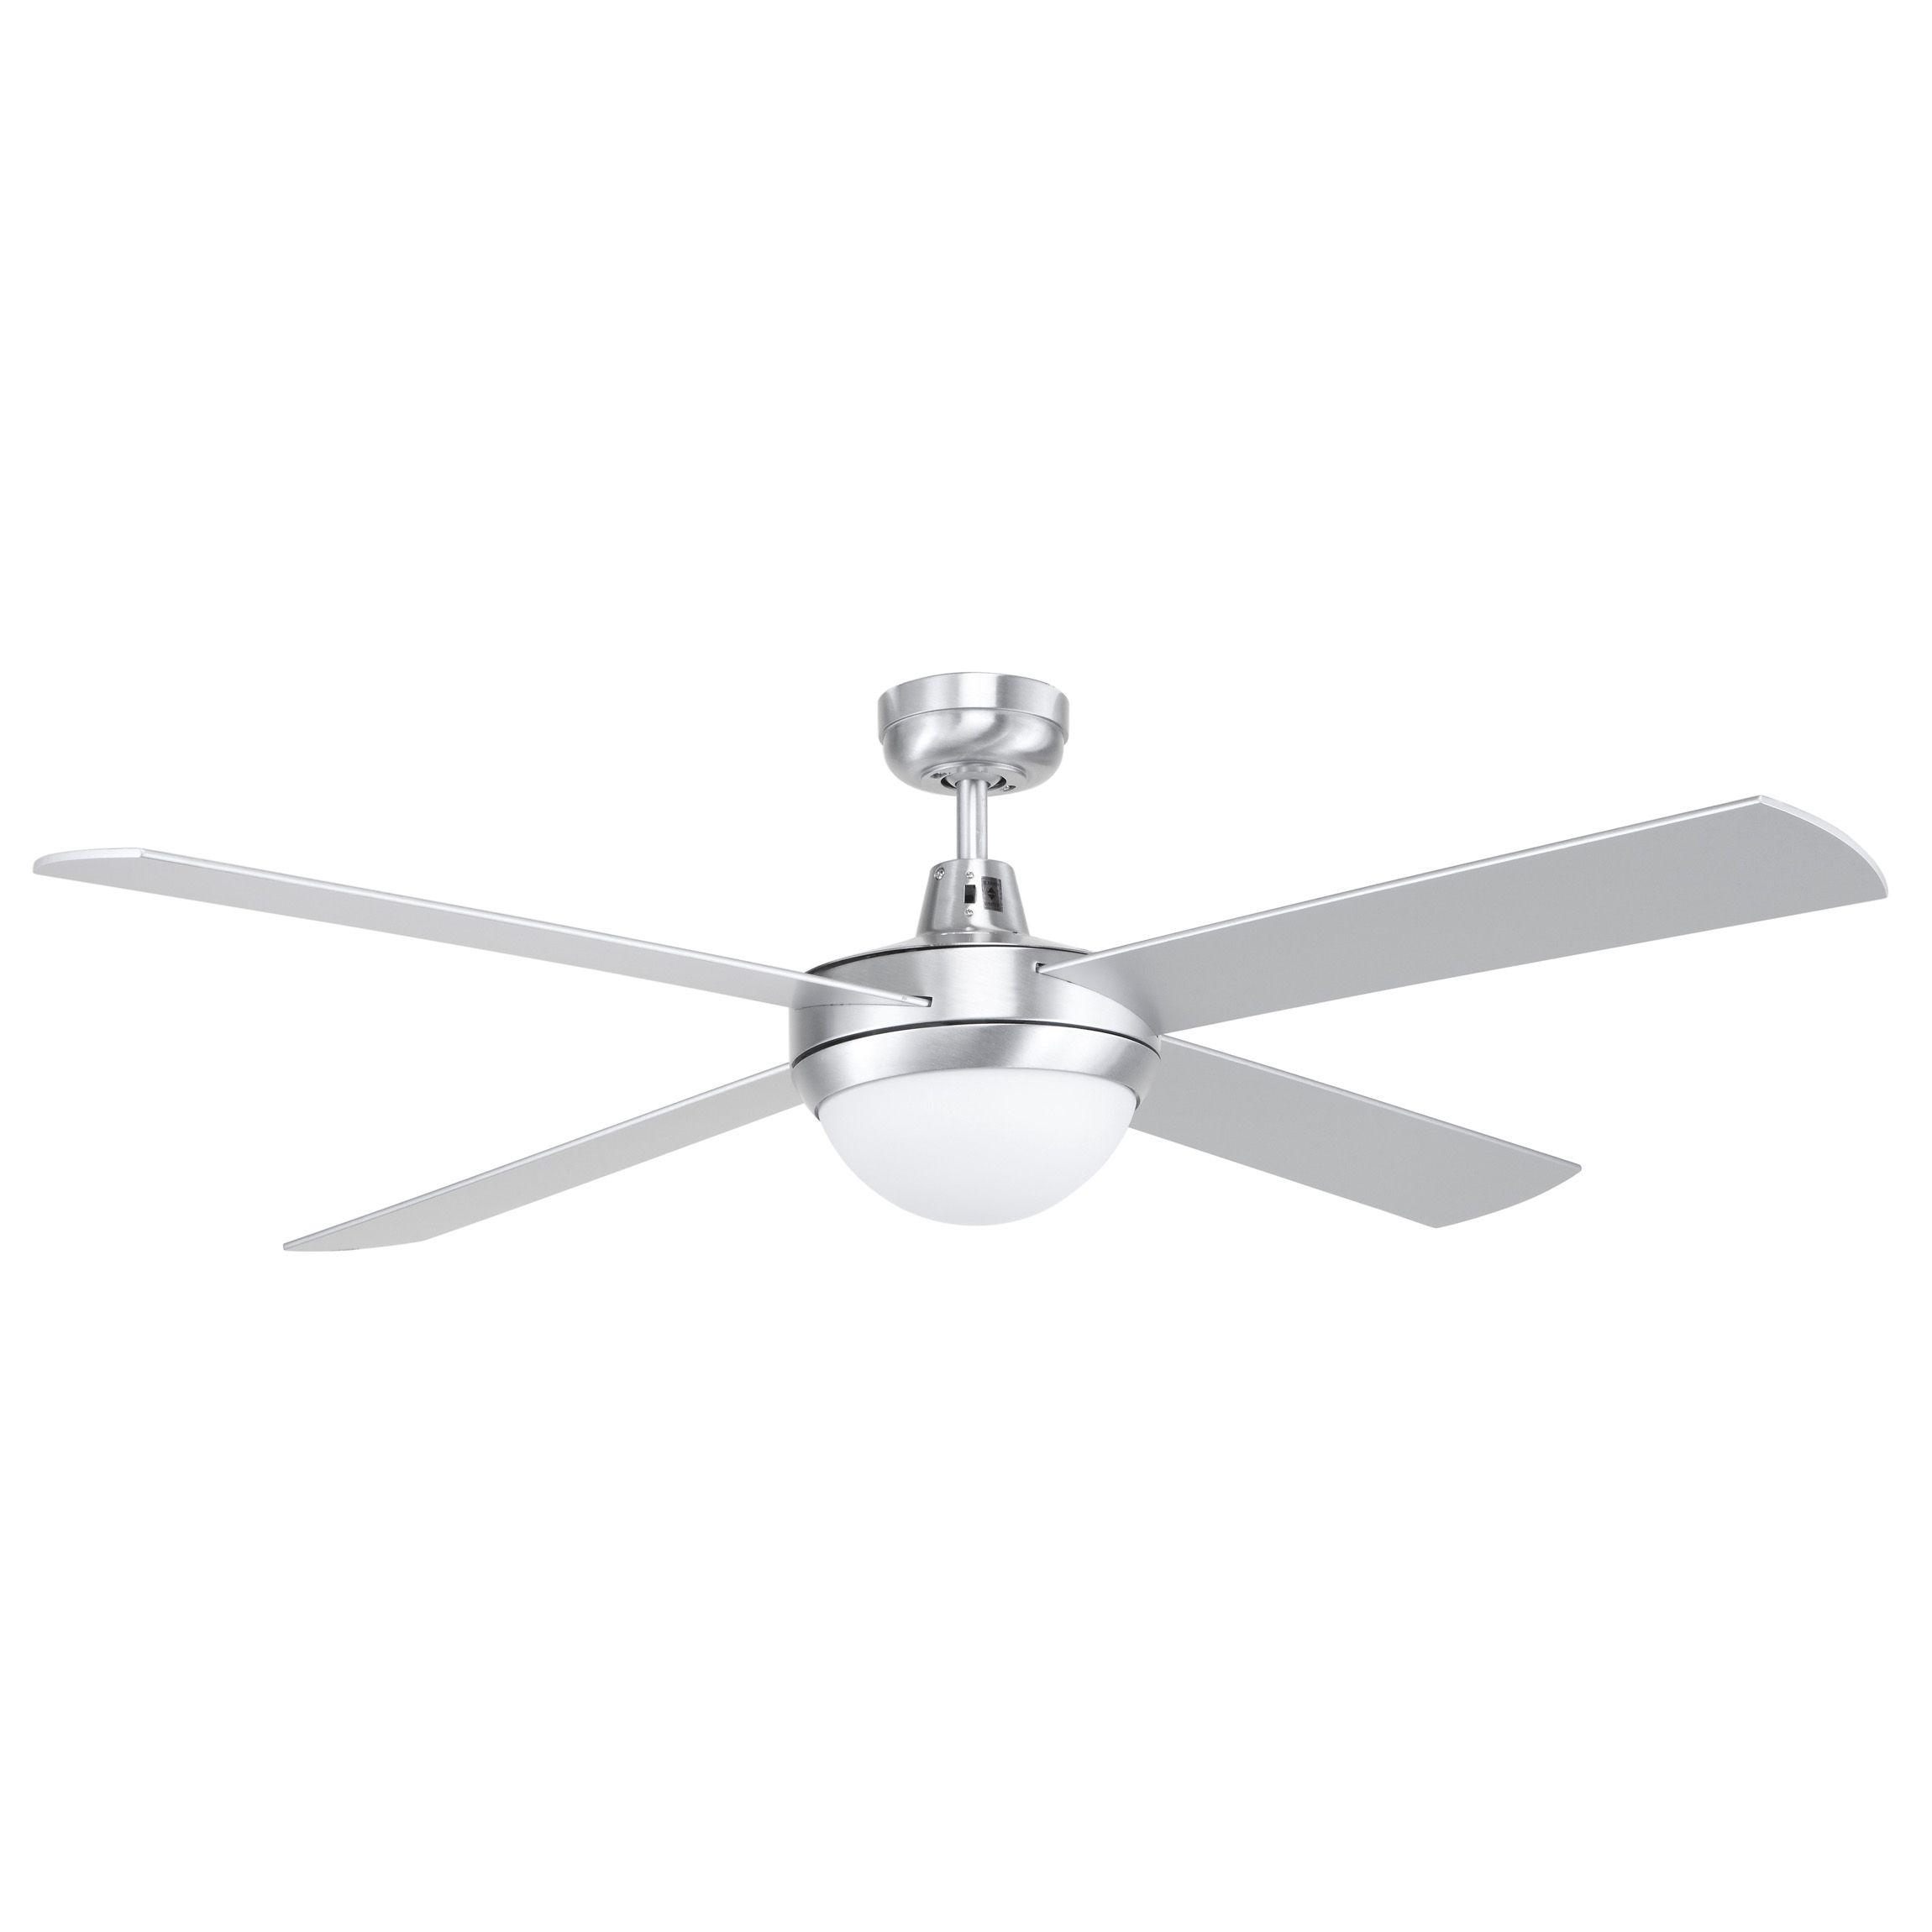 Fan Ceiling W Lght Contempo Ii 18w X 2 Silver 99894 13 Bunnings Warehouse Home Silver